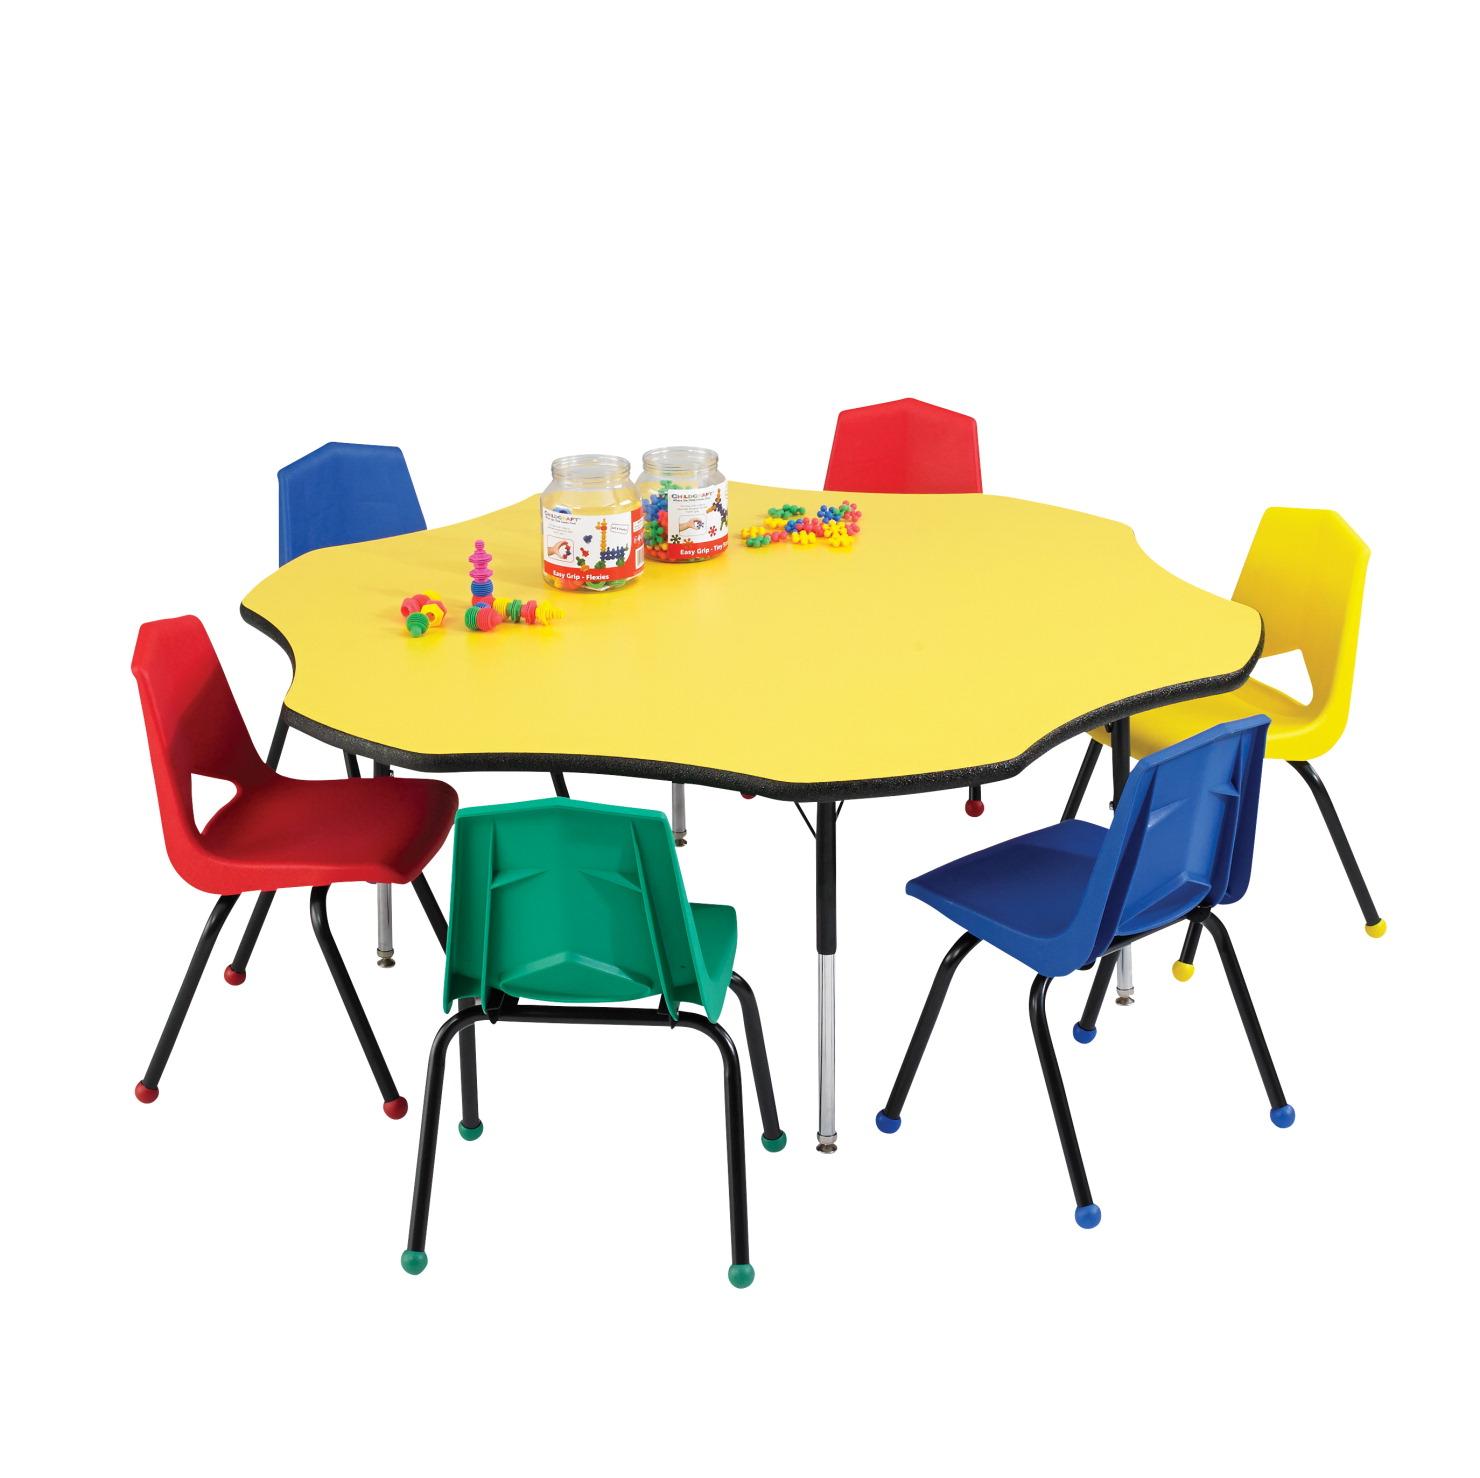 Jsp Furniture: Classroom Select LockEdge Activity Table, Flower, 60